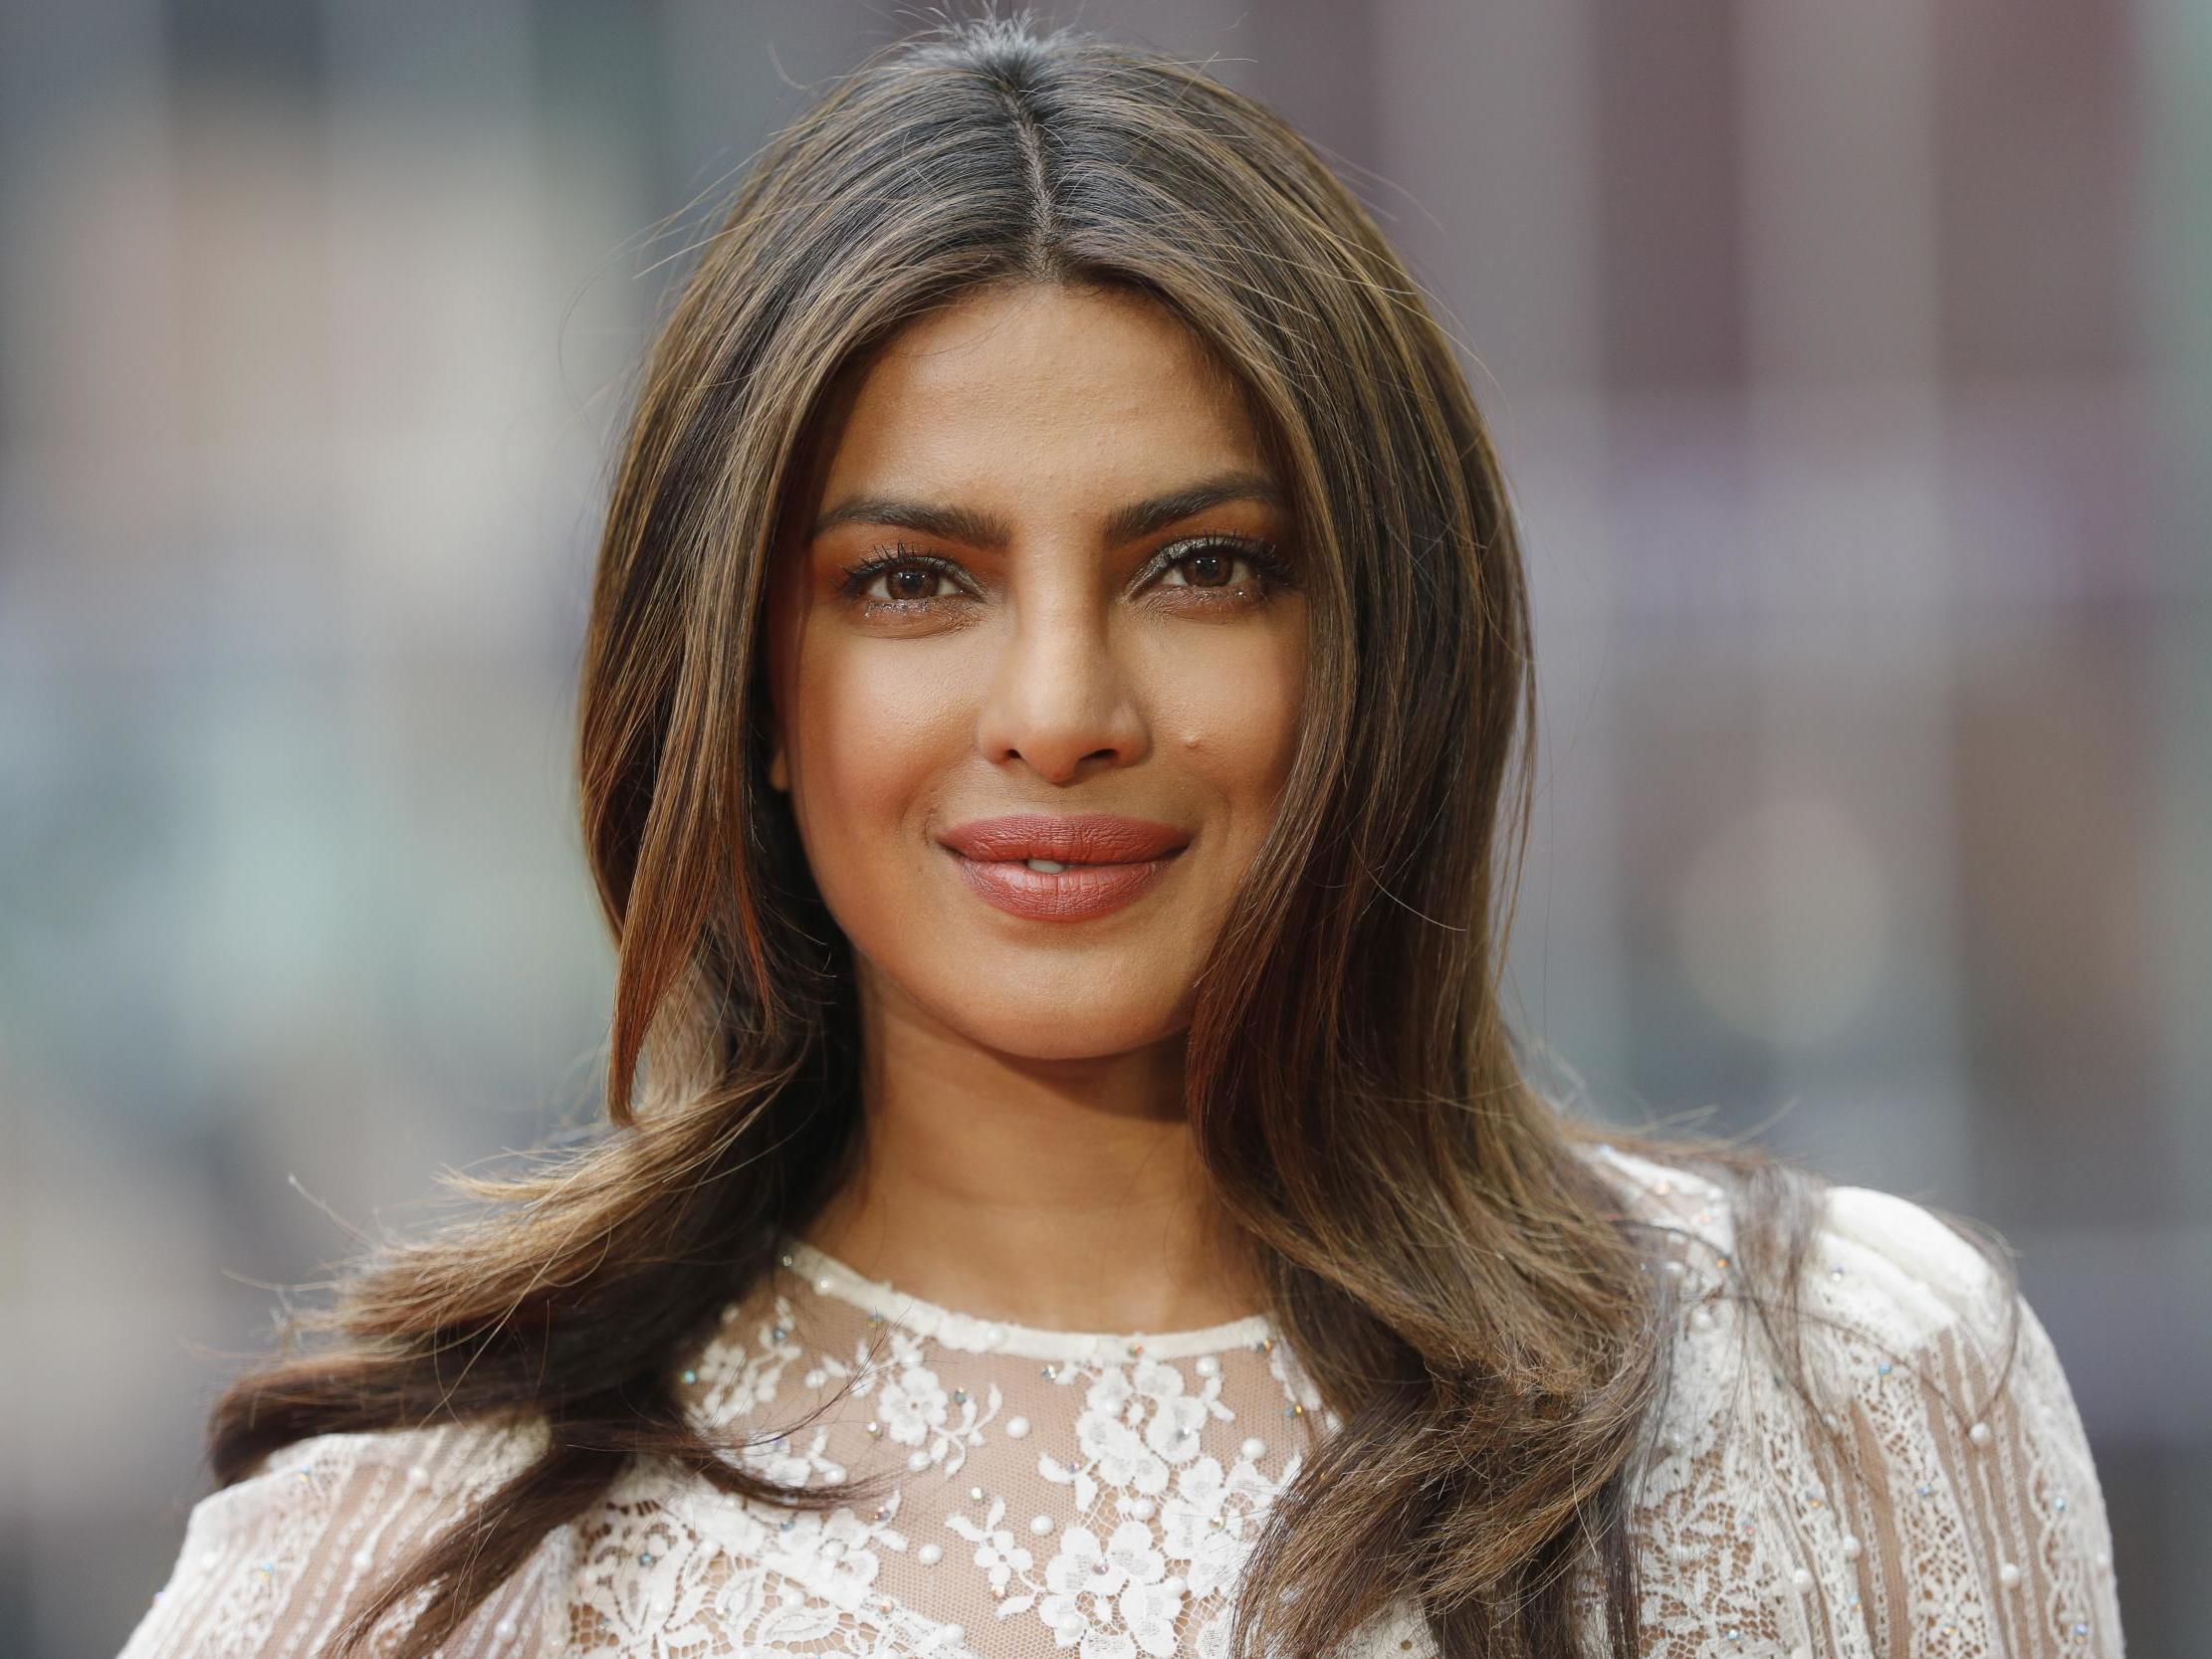 Bollywood's biggest names feature in motivational videos as India begins third week of lockdown